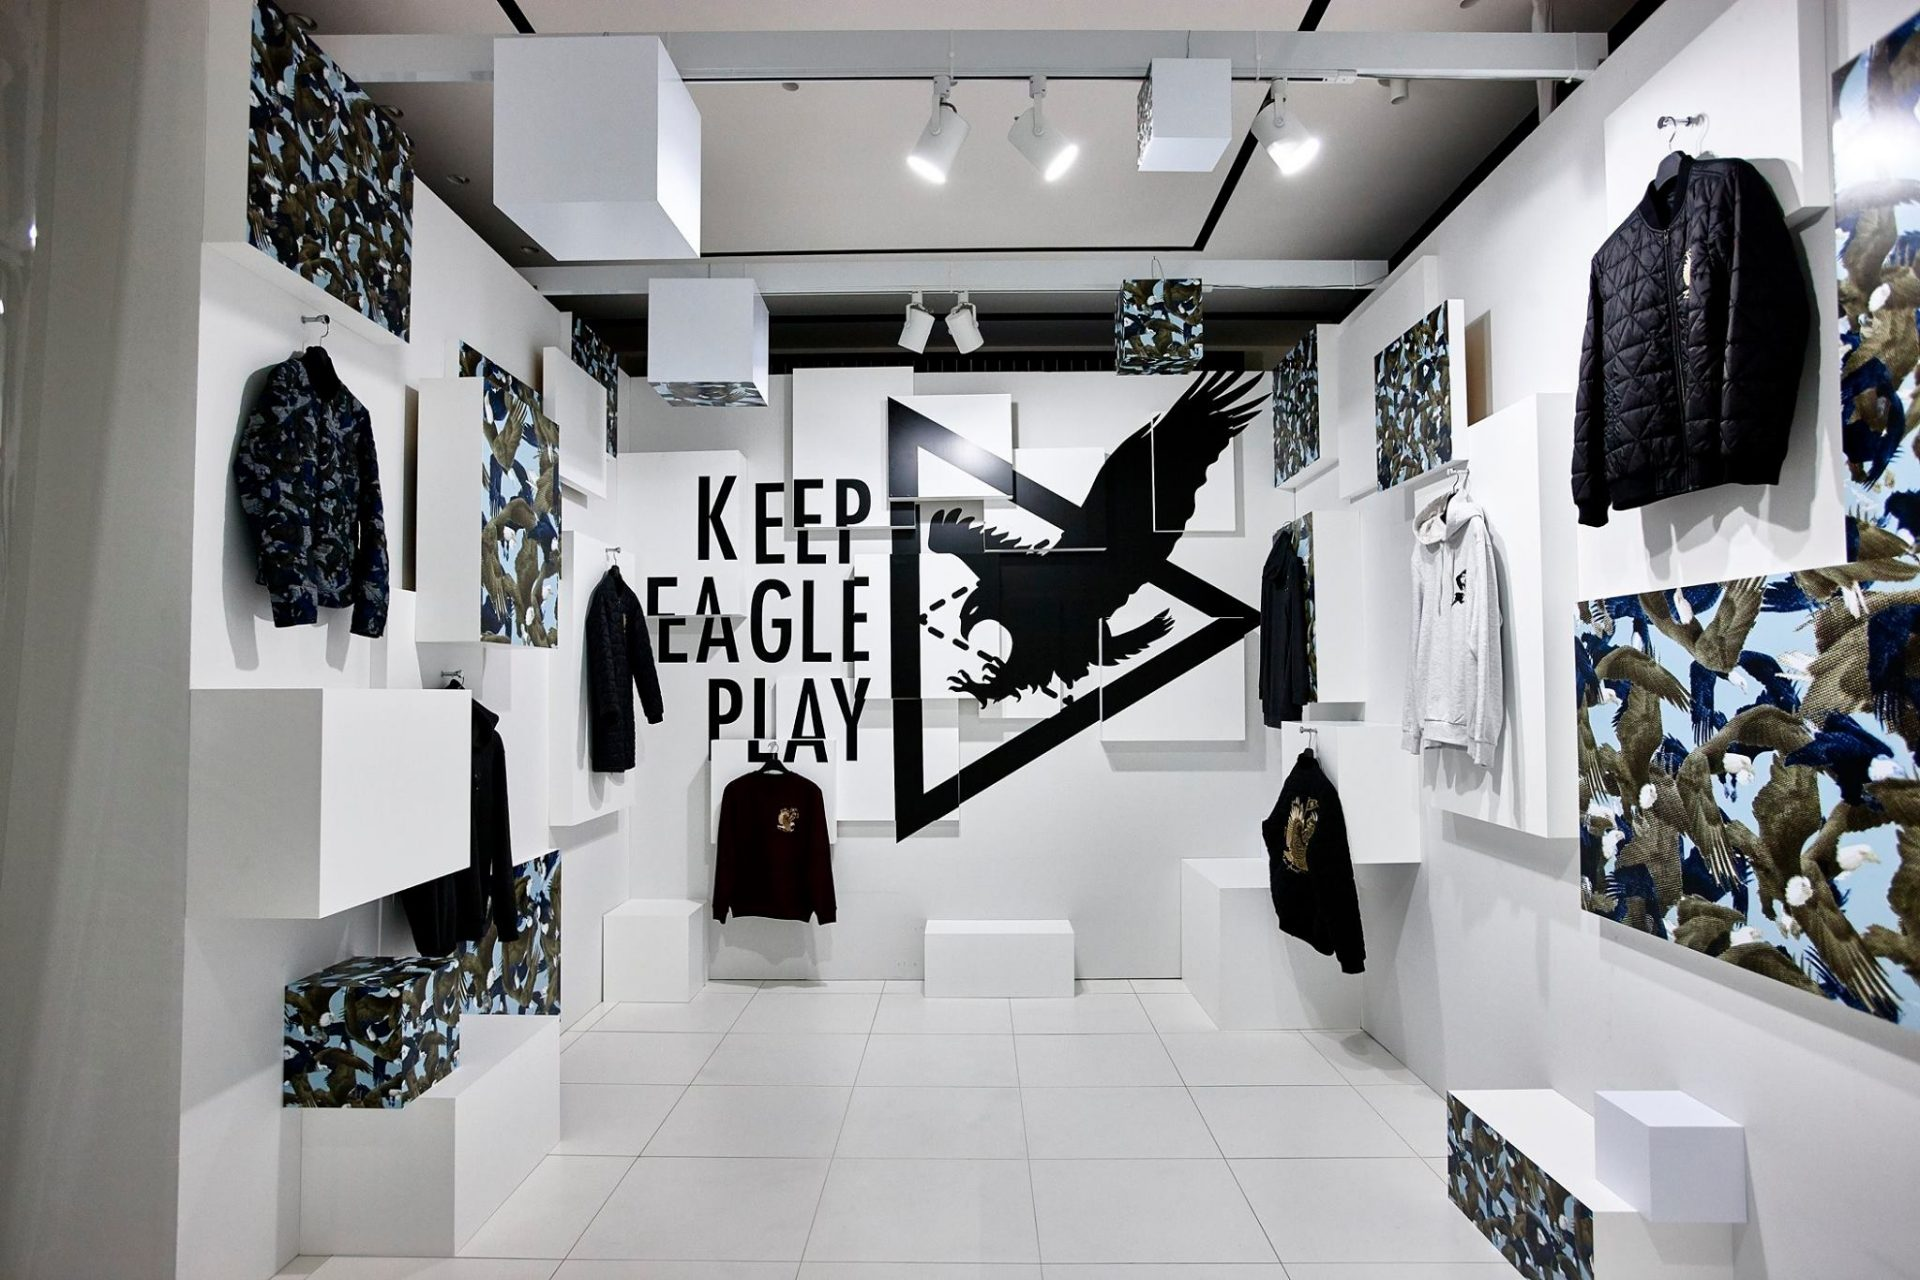 eagle_poh